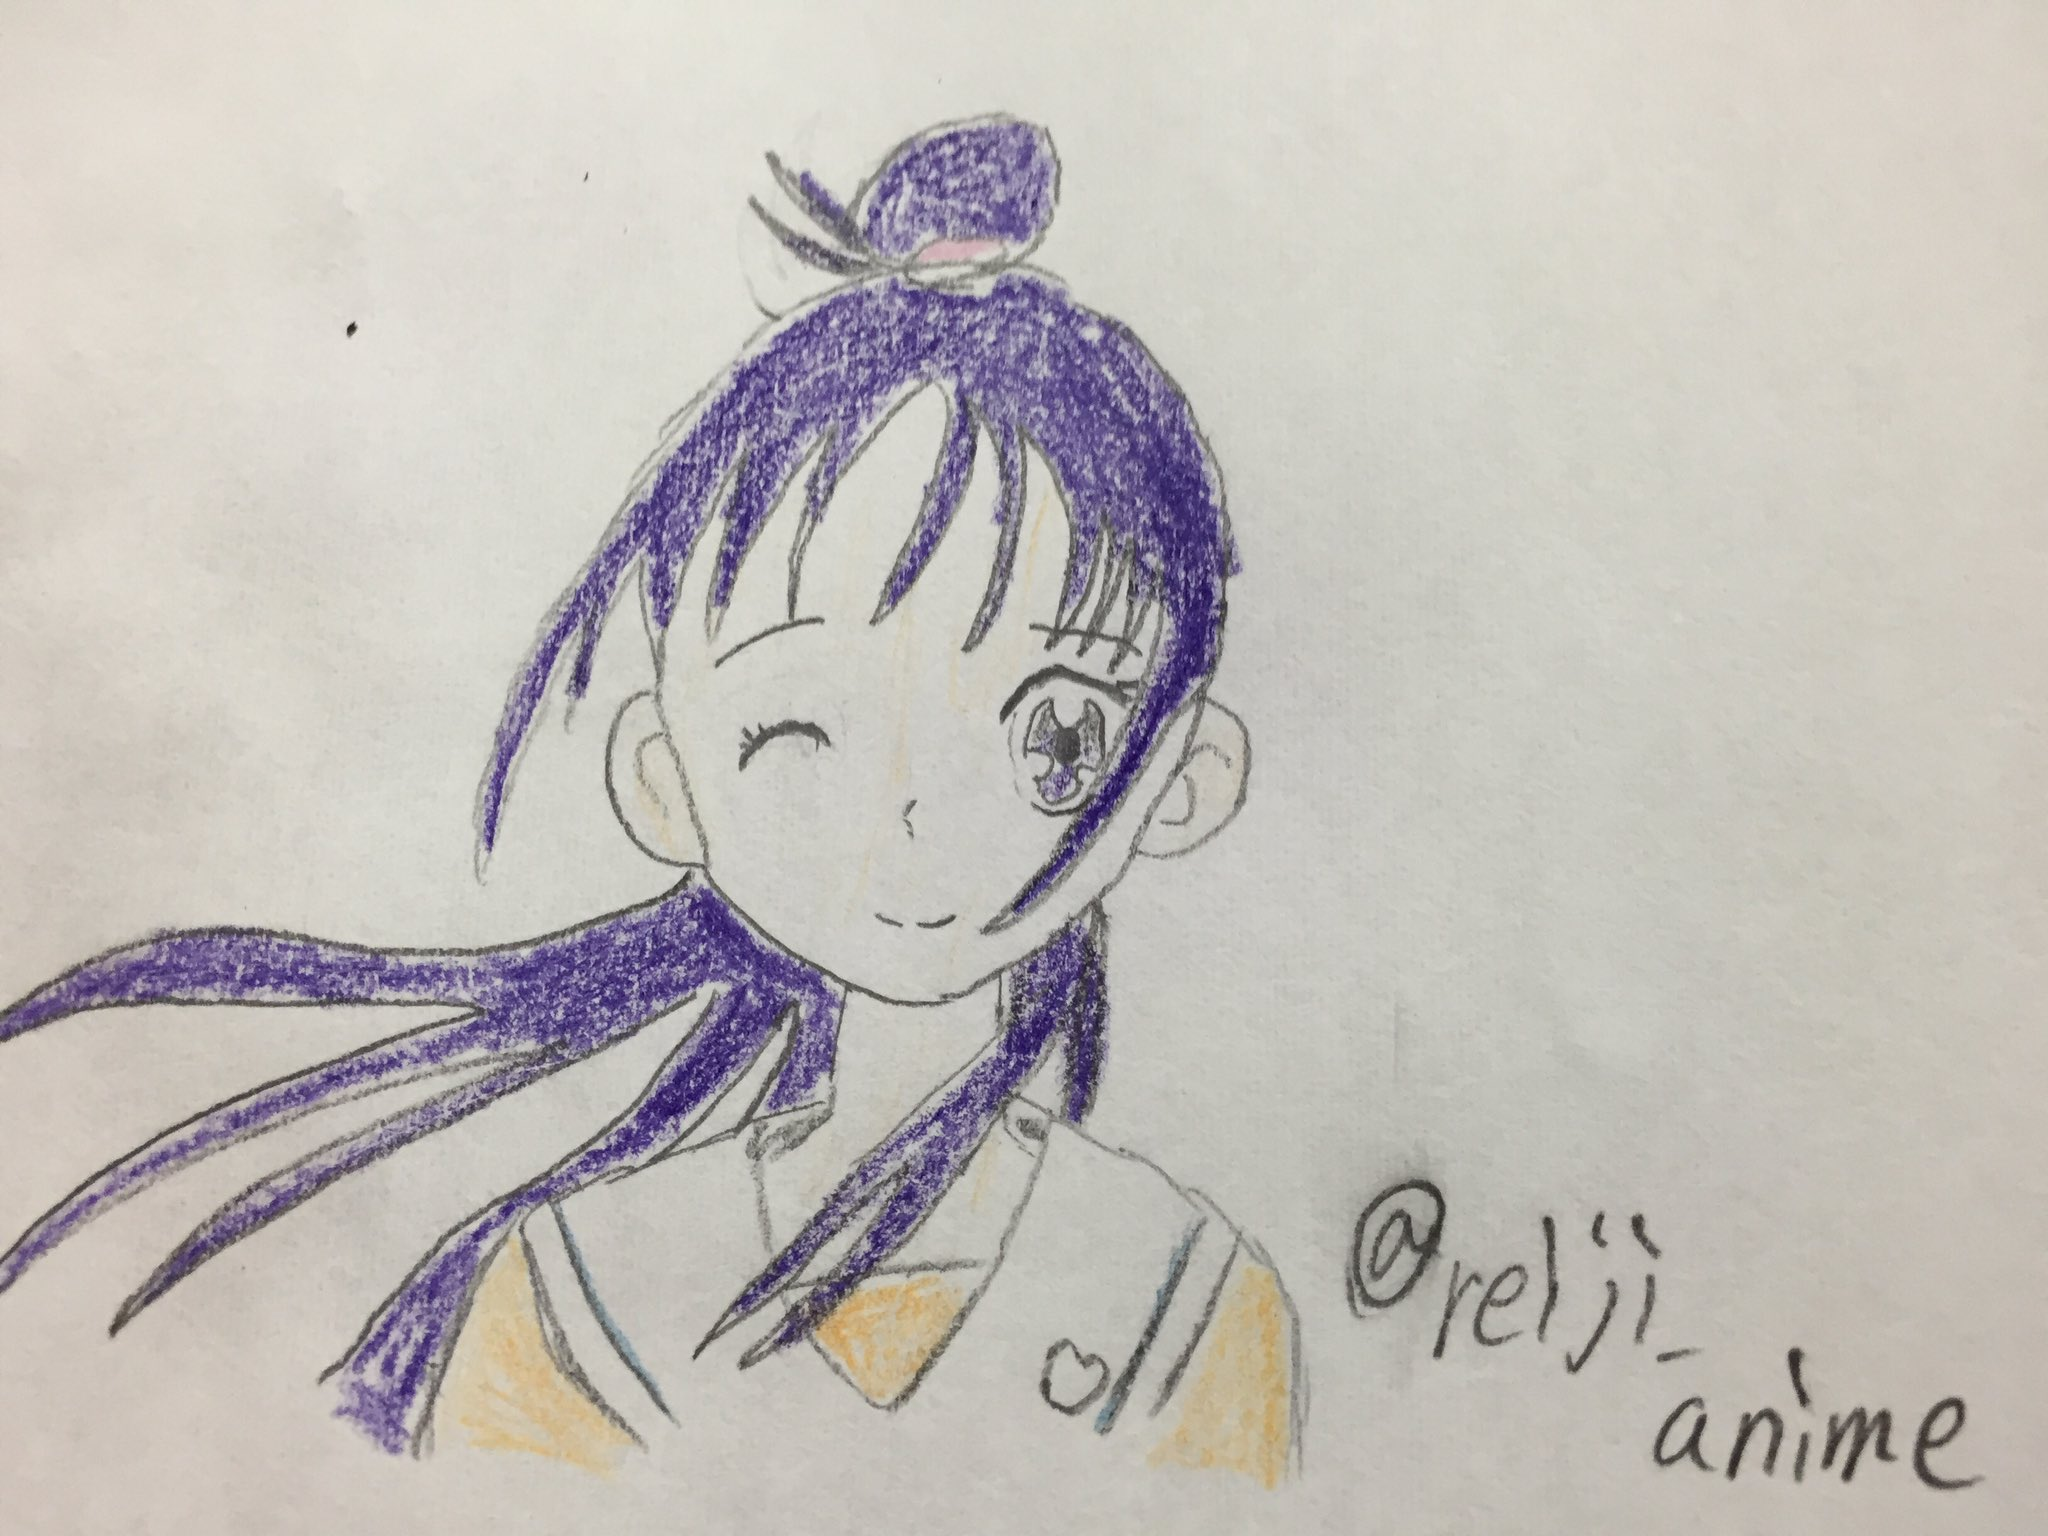 Fusion@M6twilight (@reiji_anime)さんのイラスト